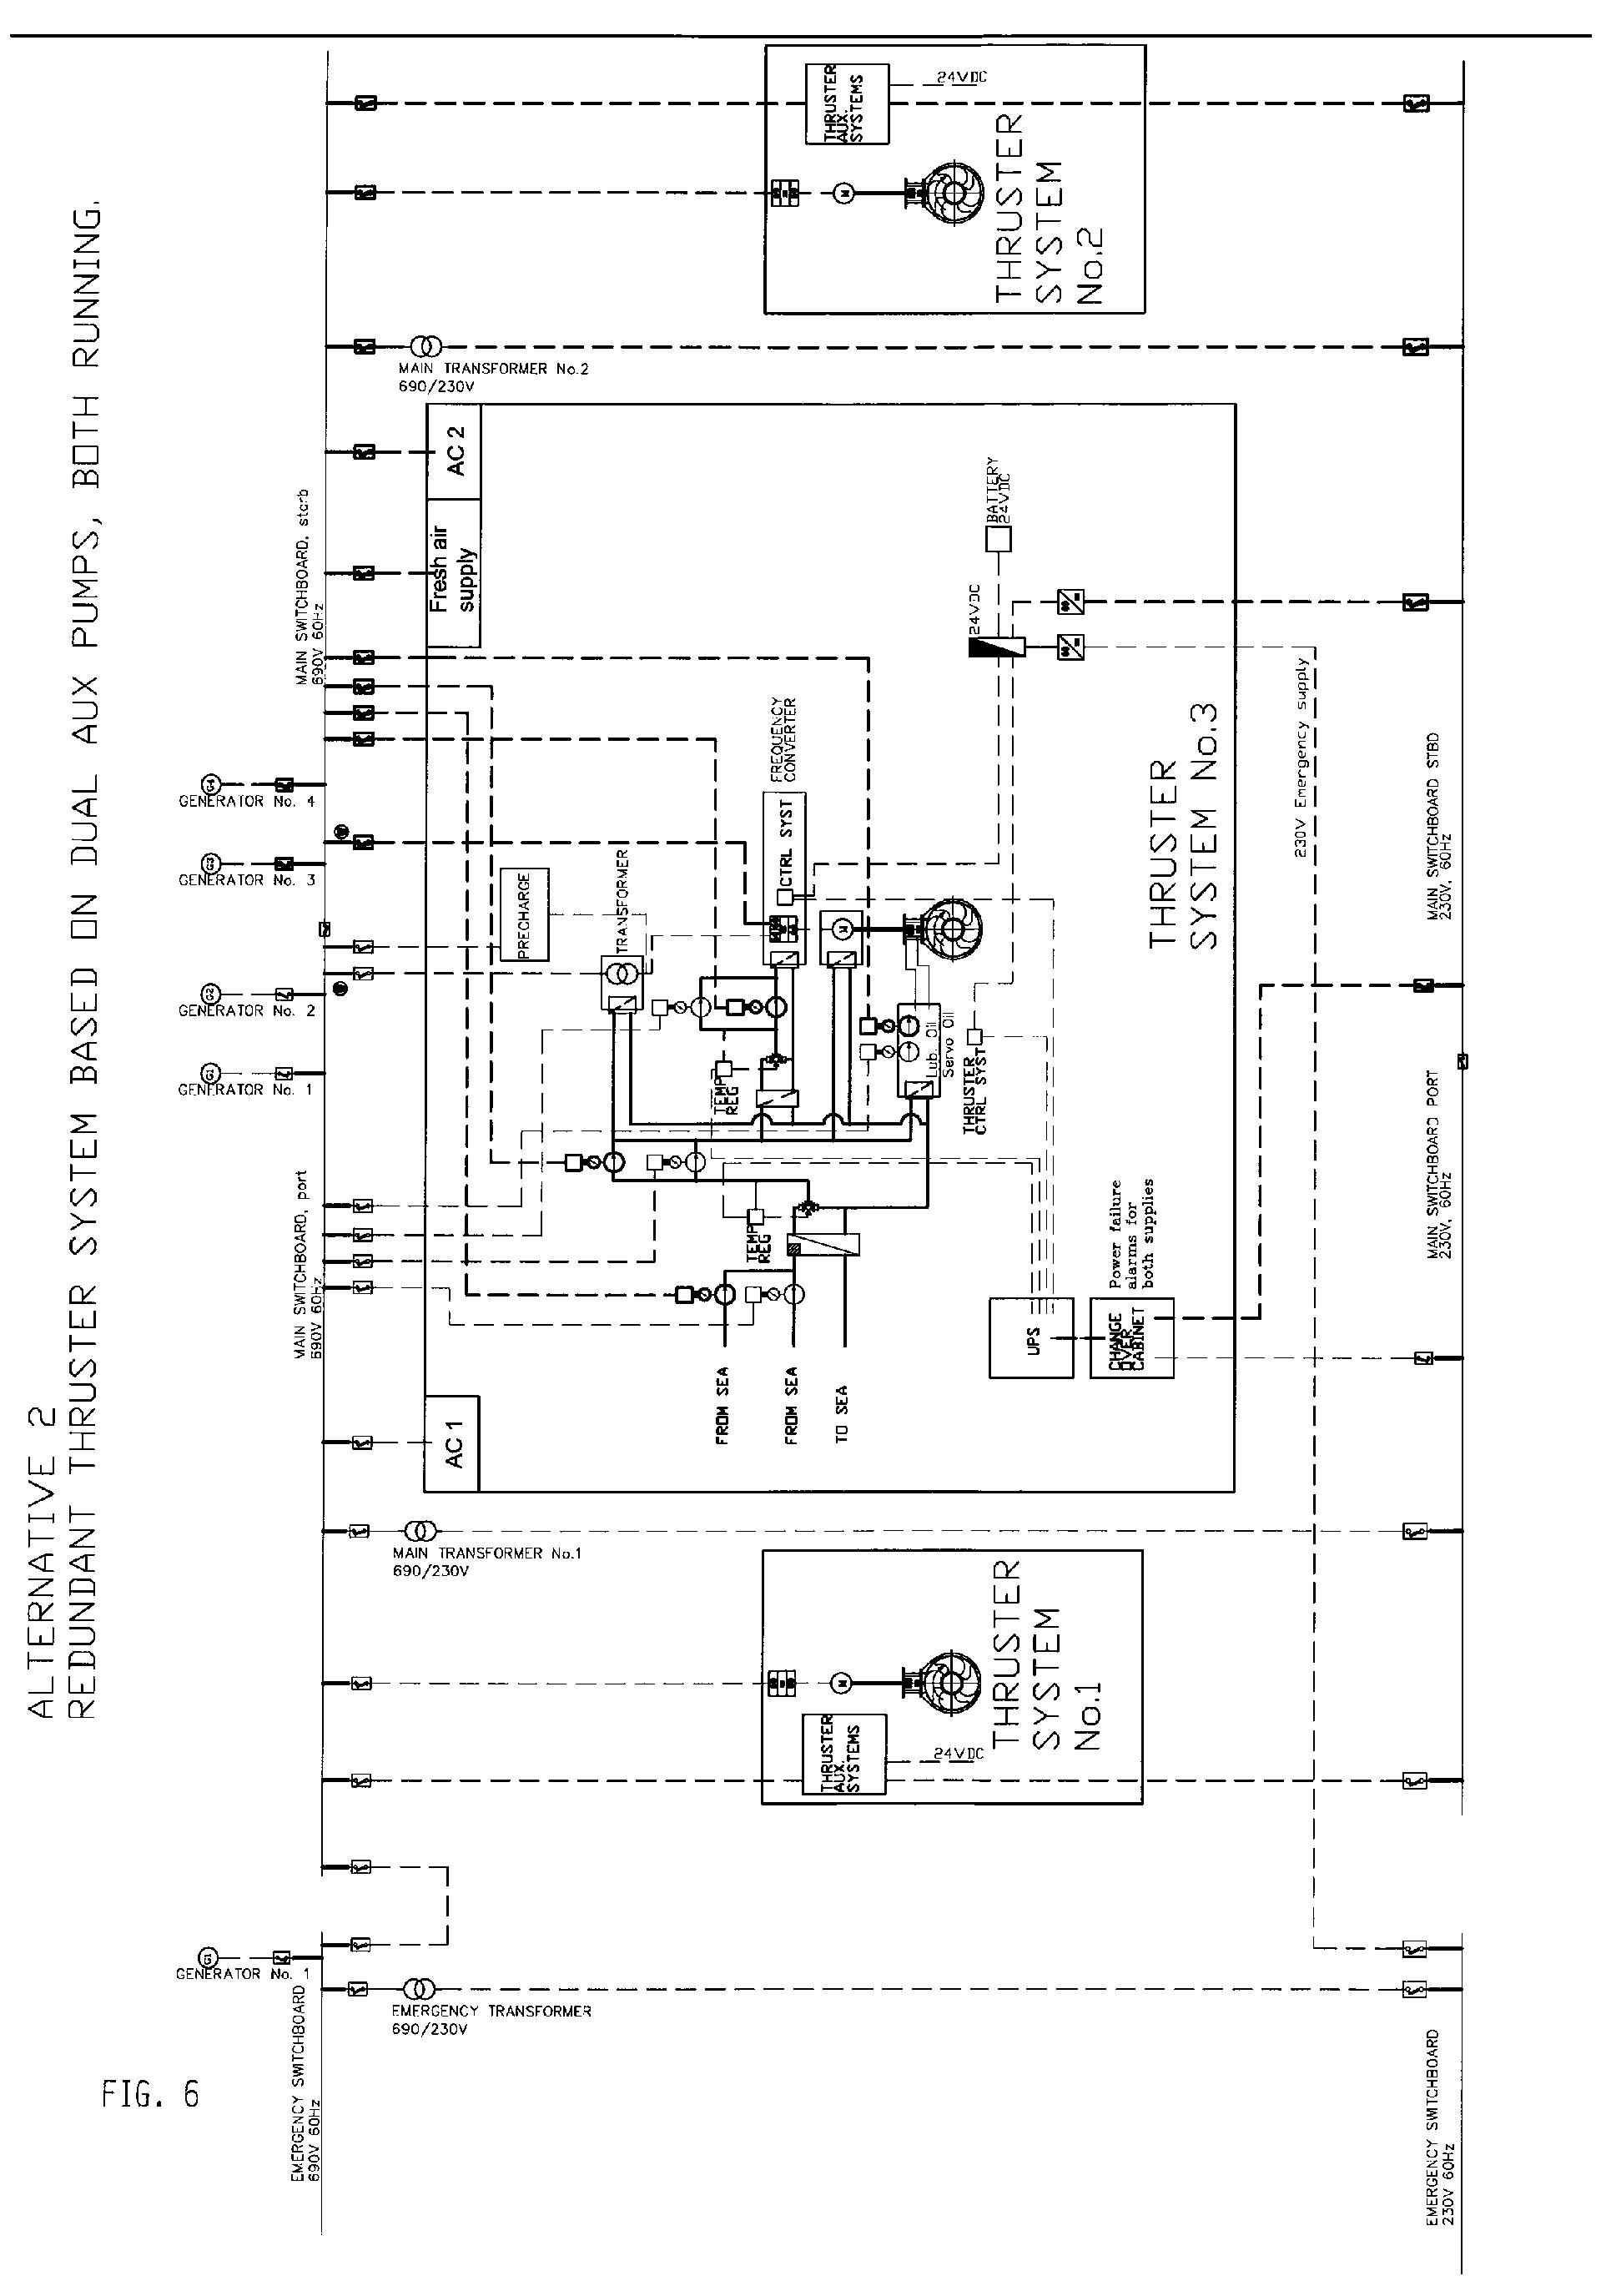 patent ep2243700a2 redundant thruster system google. Black Bedroom Furniture Sets. Home Design Ideas